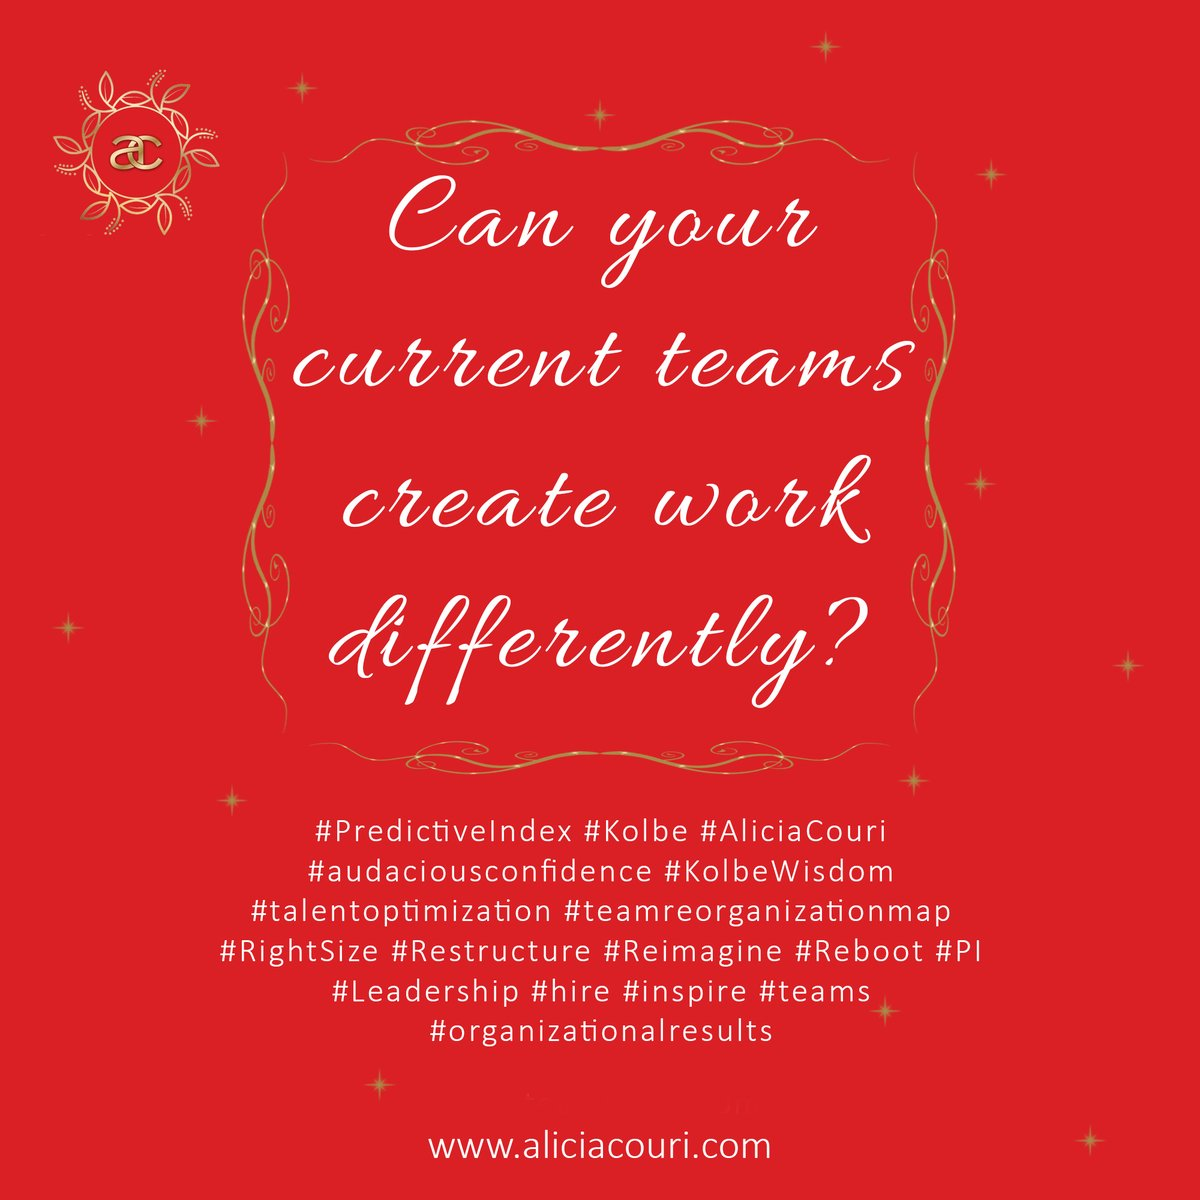 Can your current teams create work differently? #PredictiveIndex #talentoptimization #Kolbe #AliciaCouri #audaciousconfidence #KolbeWisdom #teamreorganizationmap #RightSize #Restructure #Reimagine #Reboot #PI #Leadership #hire #inspire #teams